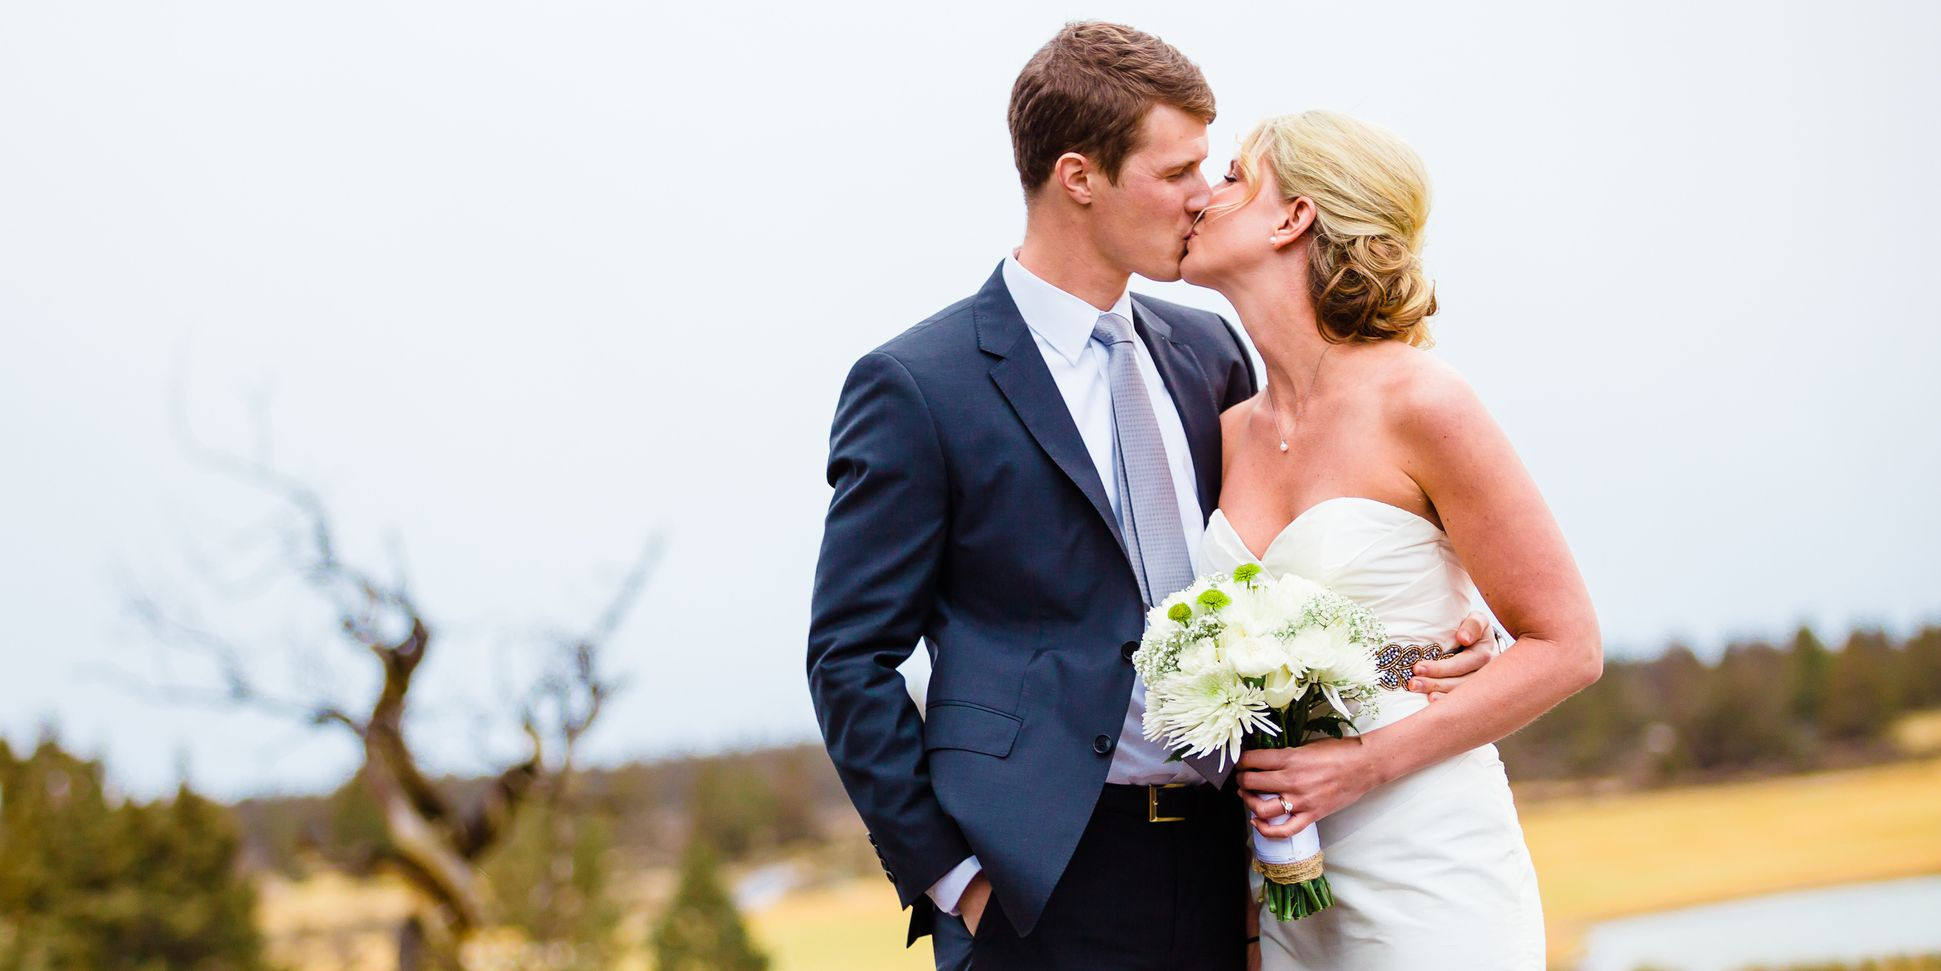 wedding gift rules